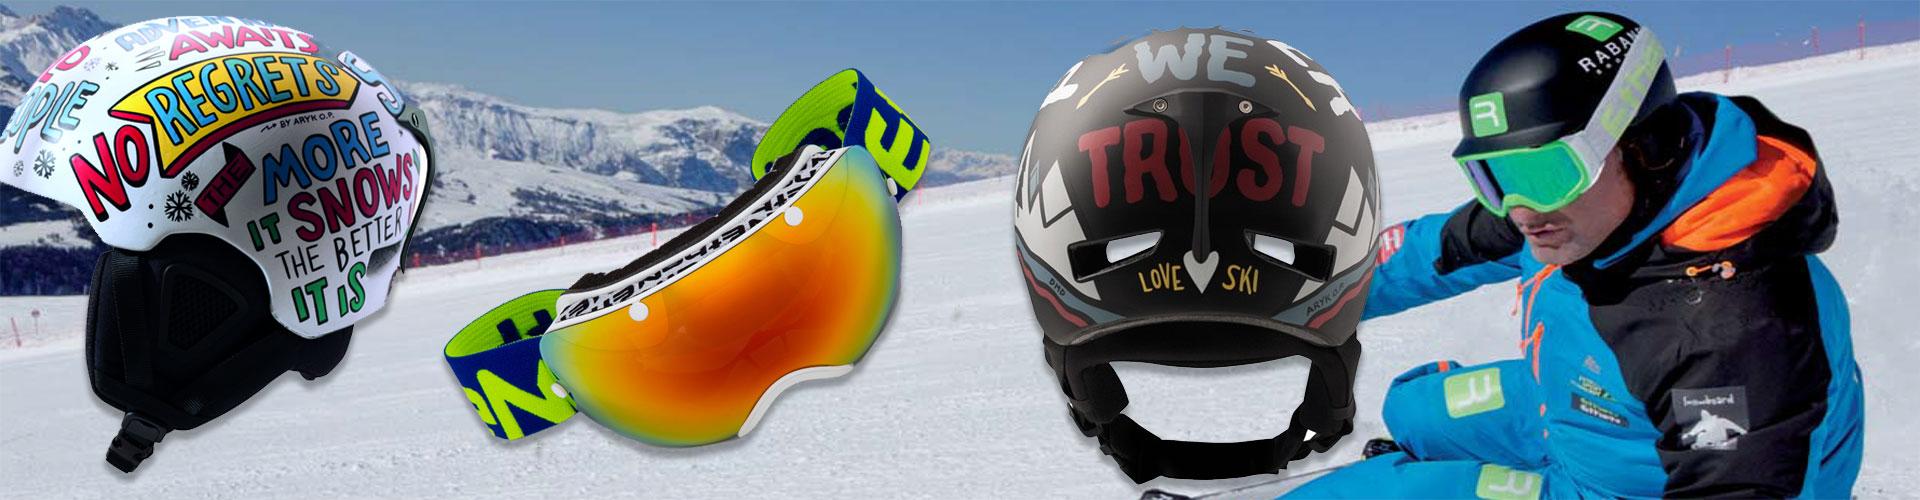 Speciale neve: offerta caschi DMD e maschere Ethen, scopri le occasioni !